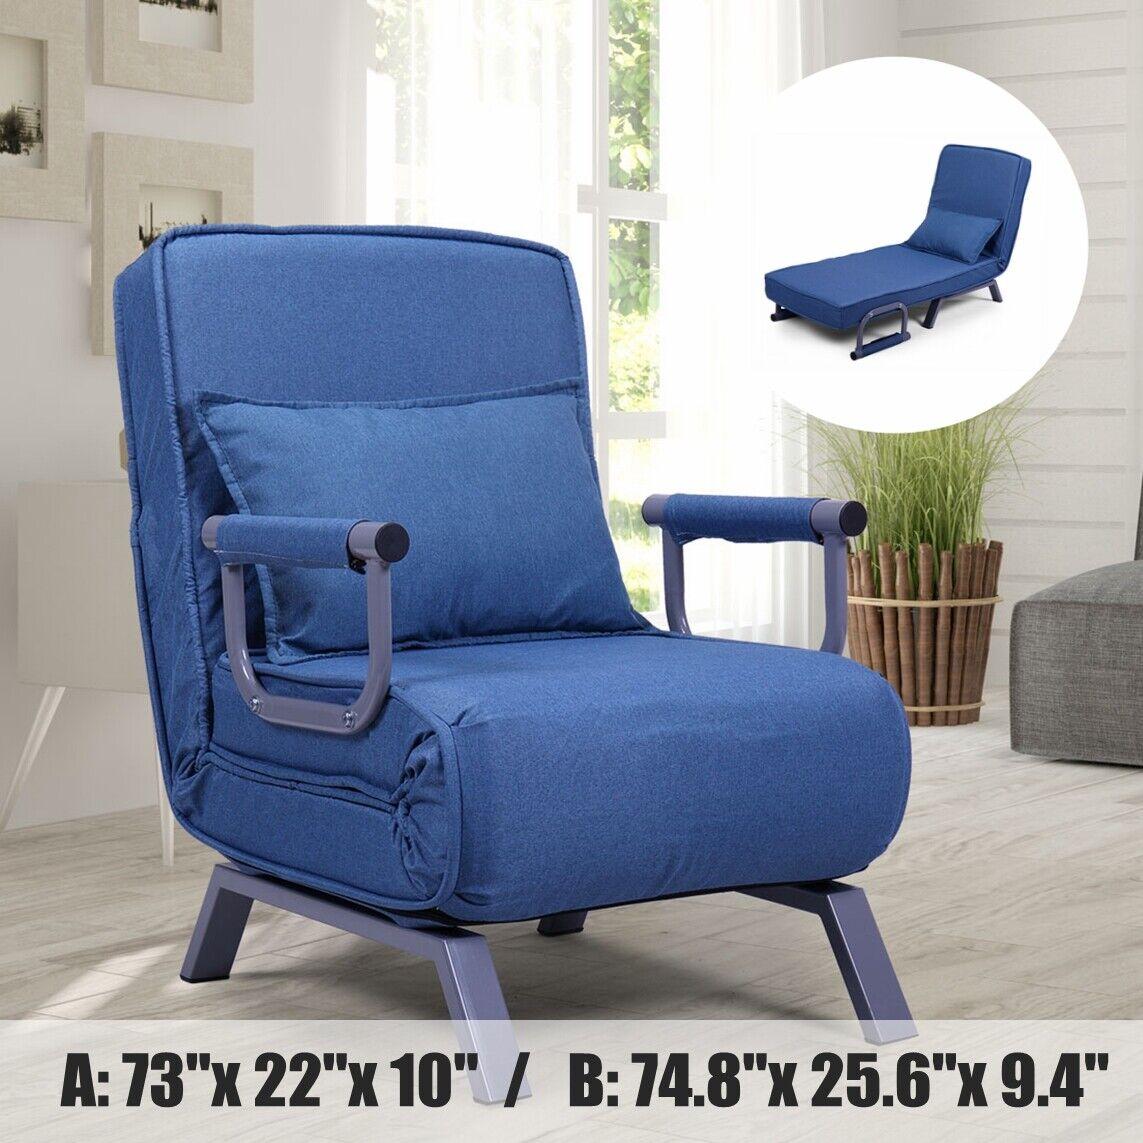 Folding Sofa Chair Chaise Lounge Single Sleeper Bed Arm Chai